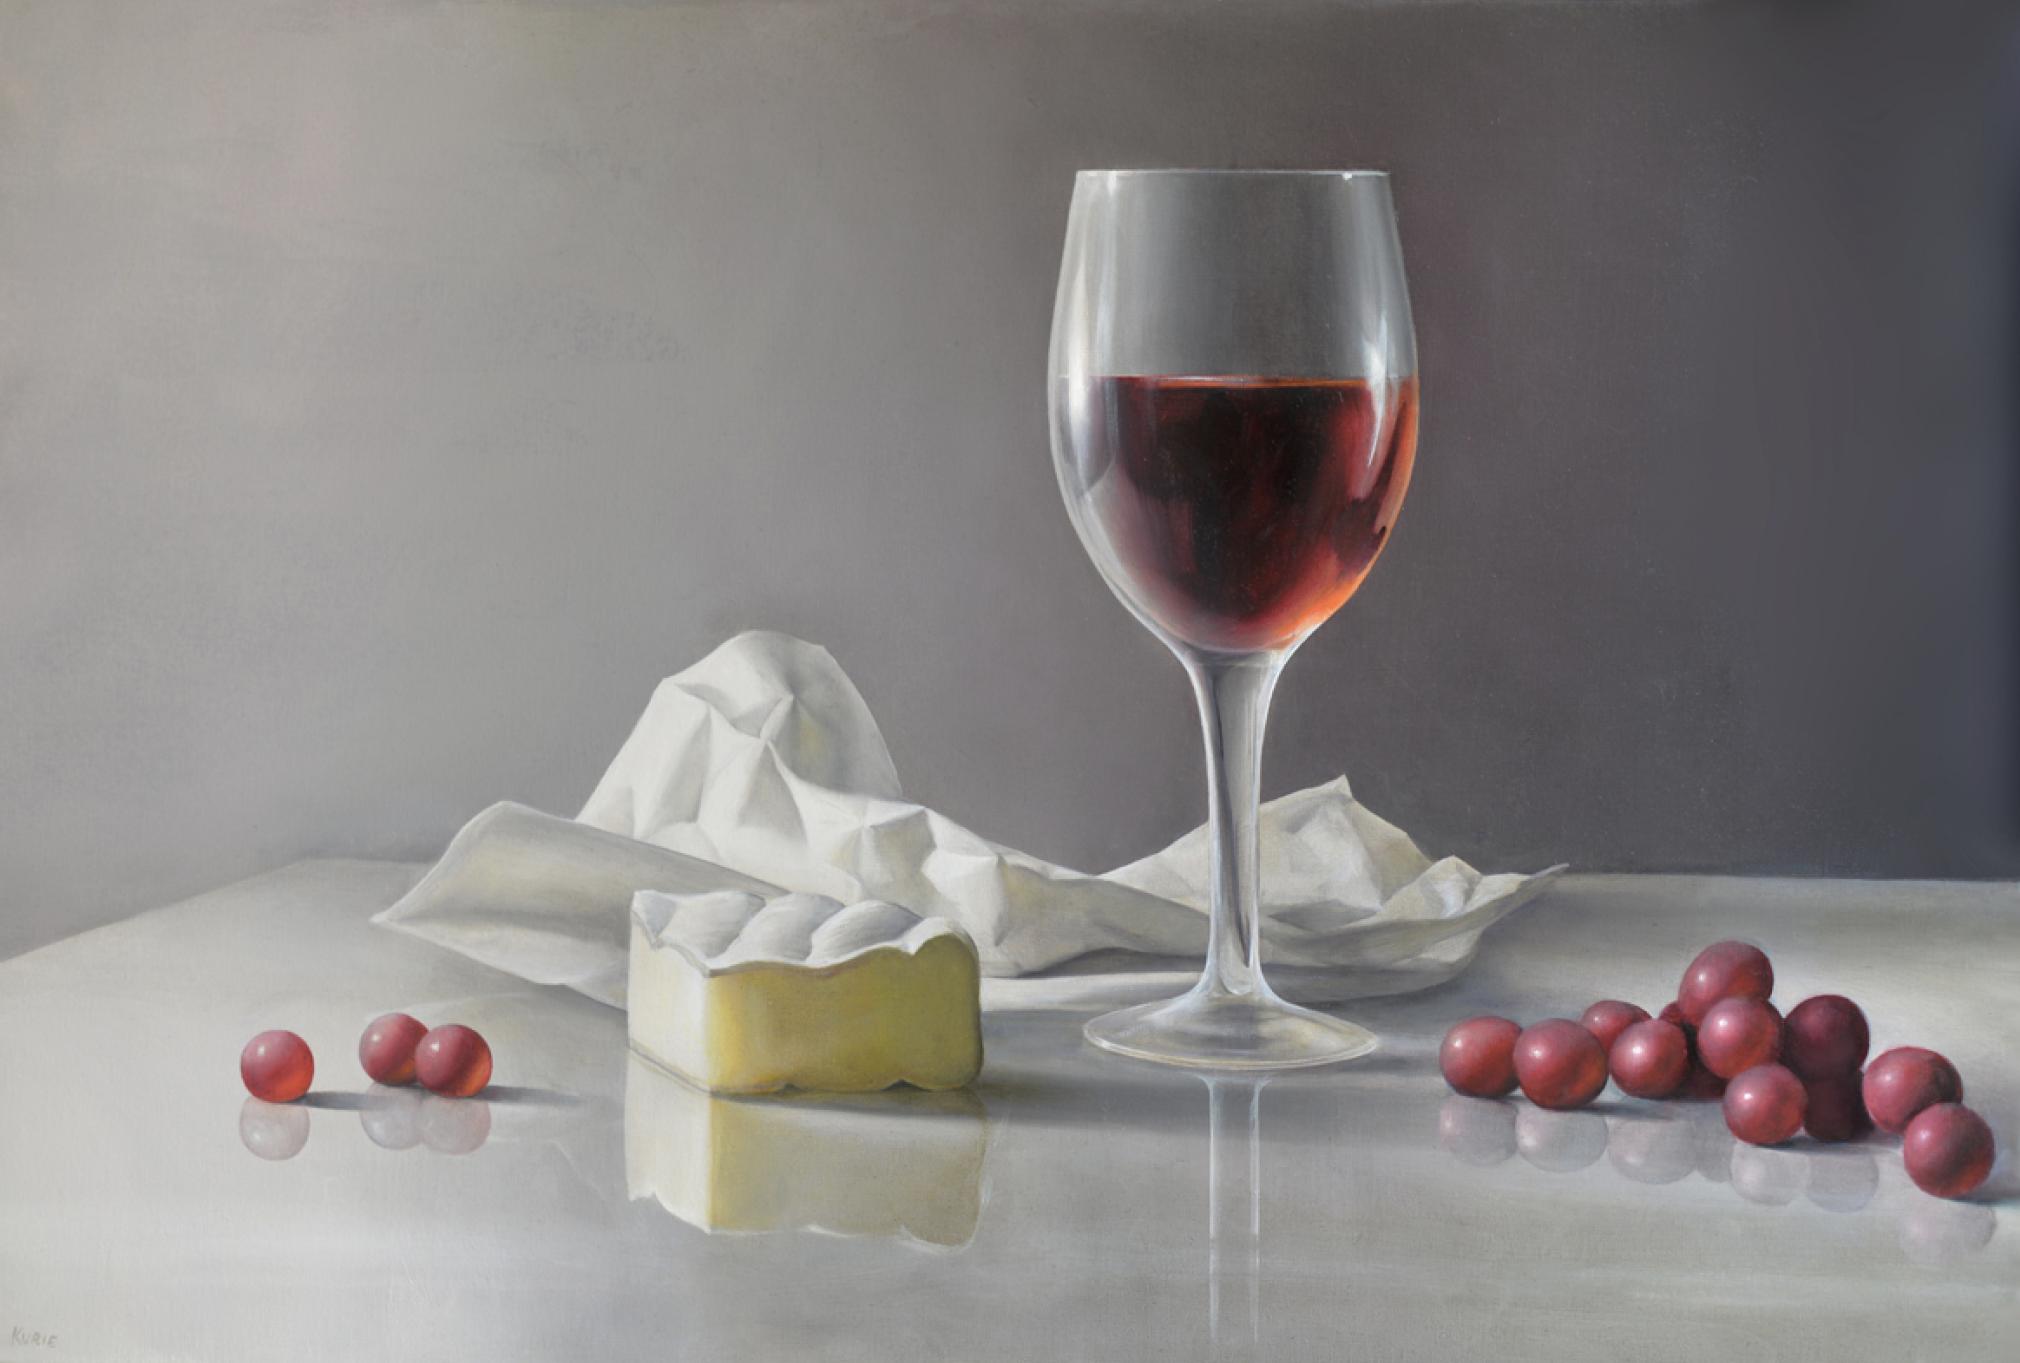 Wine & Brie